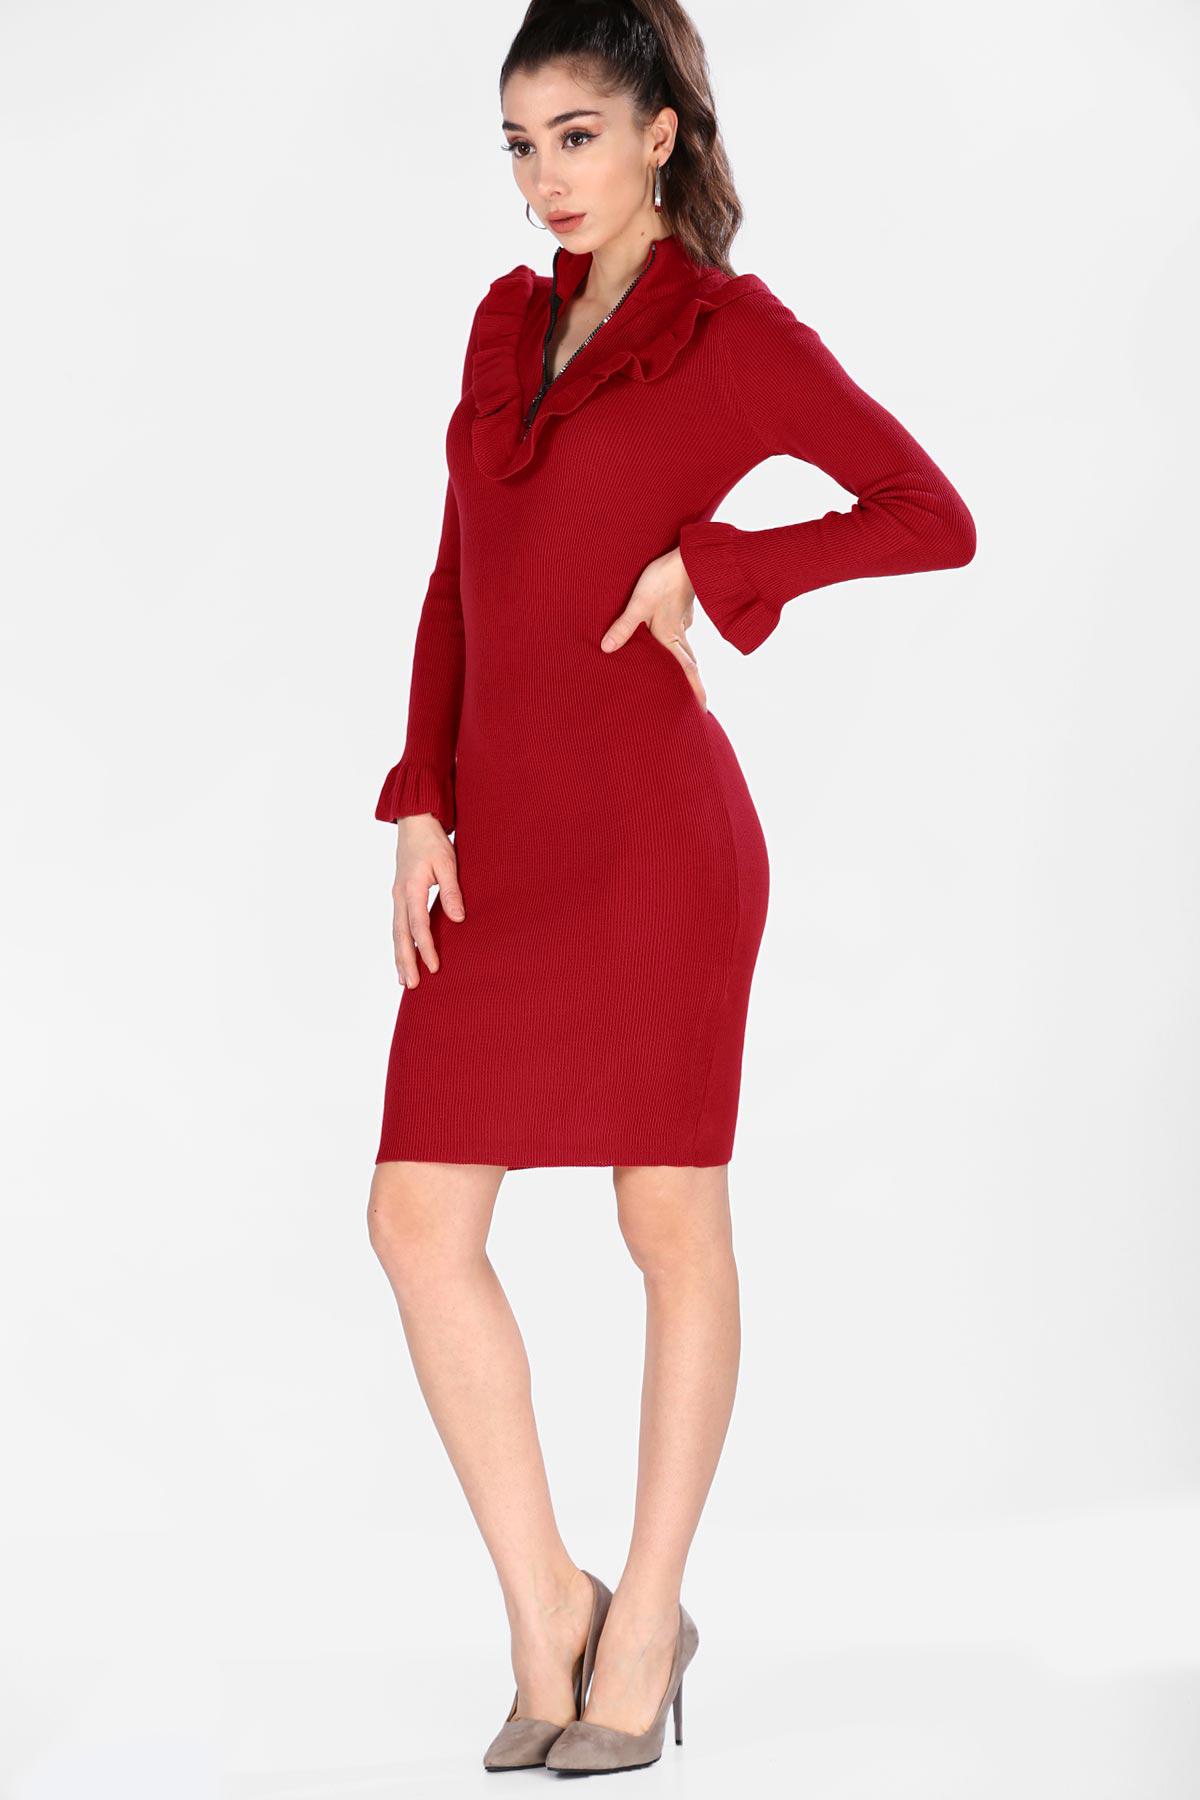 849ab1ea91174 Patırtı Kırmızı Kadın Triko Elbise - Glami.com.tr